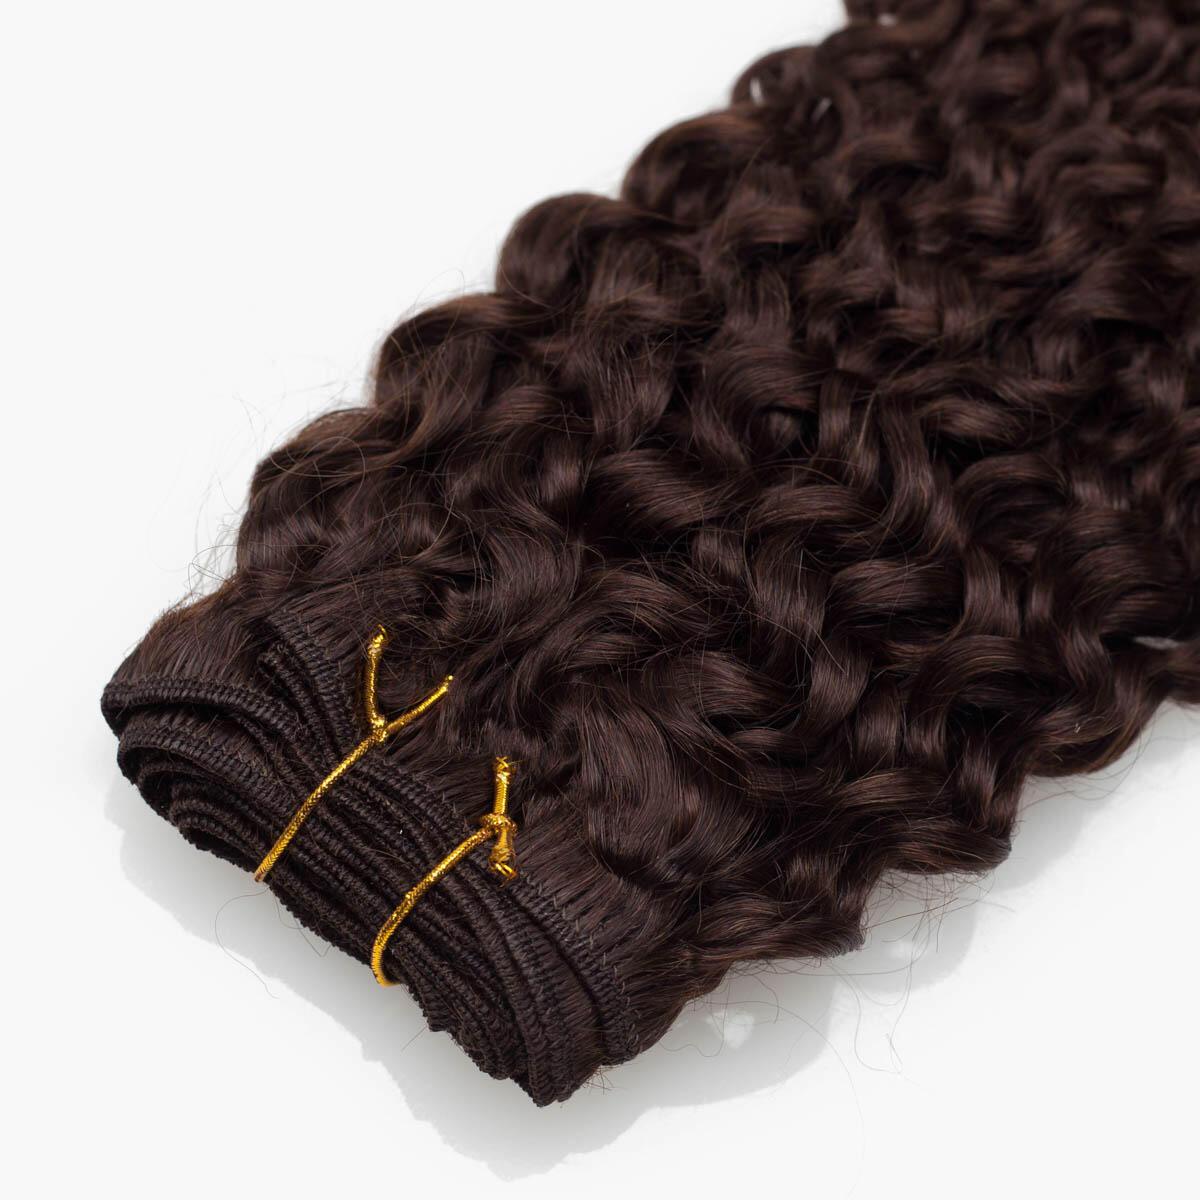 Hair Weft 2.2 Coffee Brown 35 cm